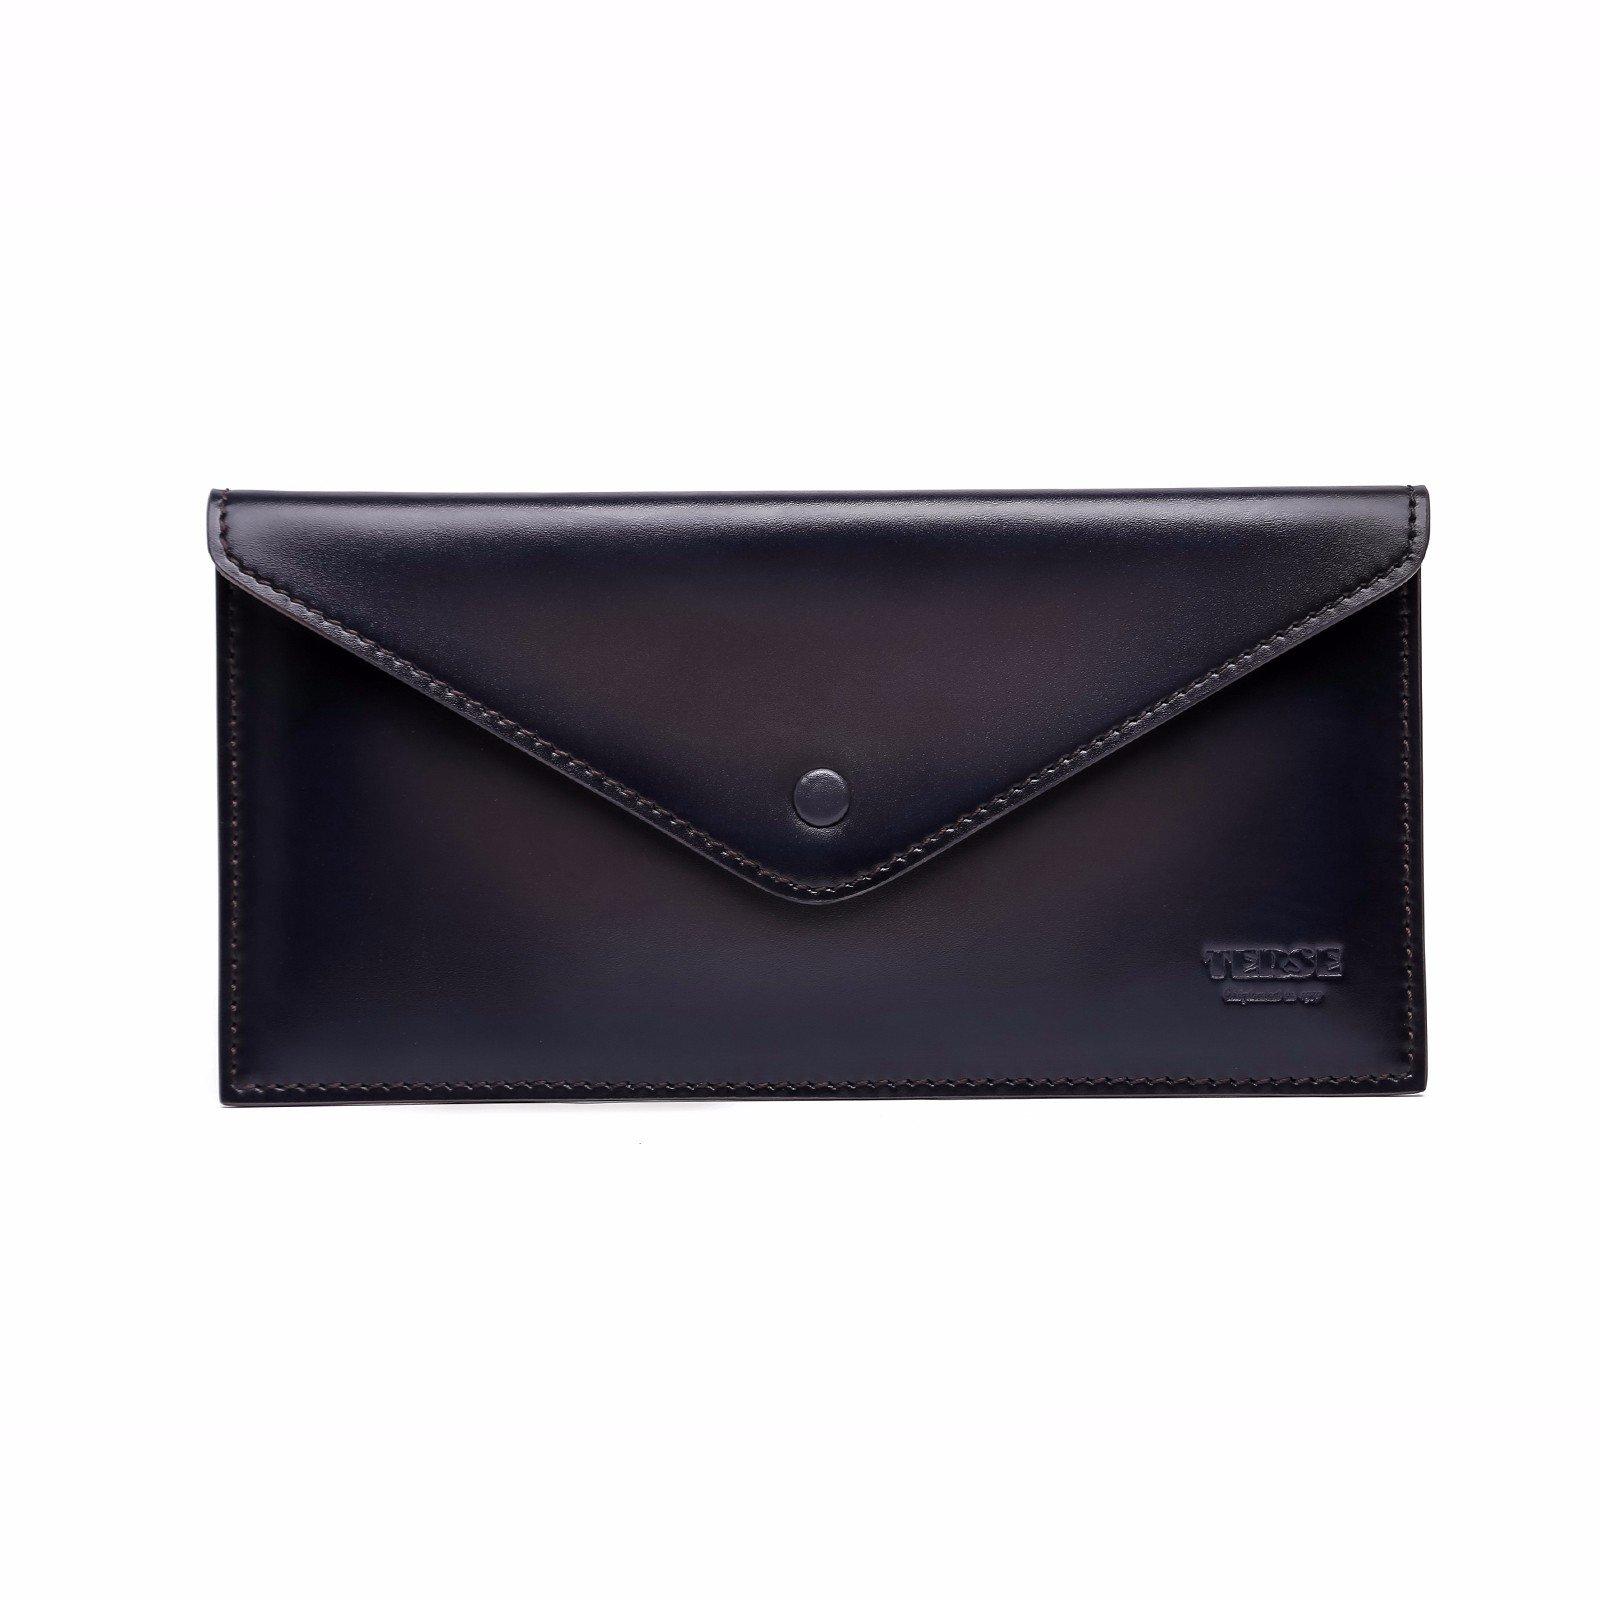 TERSE Men's Clutch Bag Leather Wallet Card Holder Messenger Bags (Iron Grey)